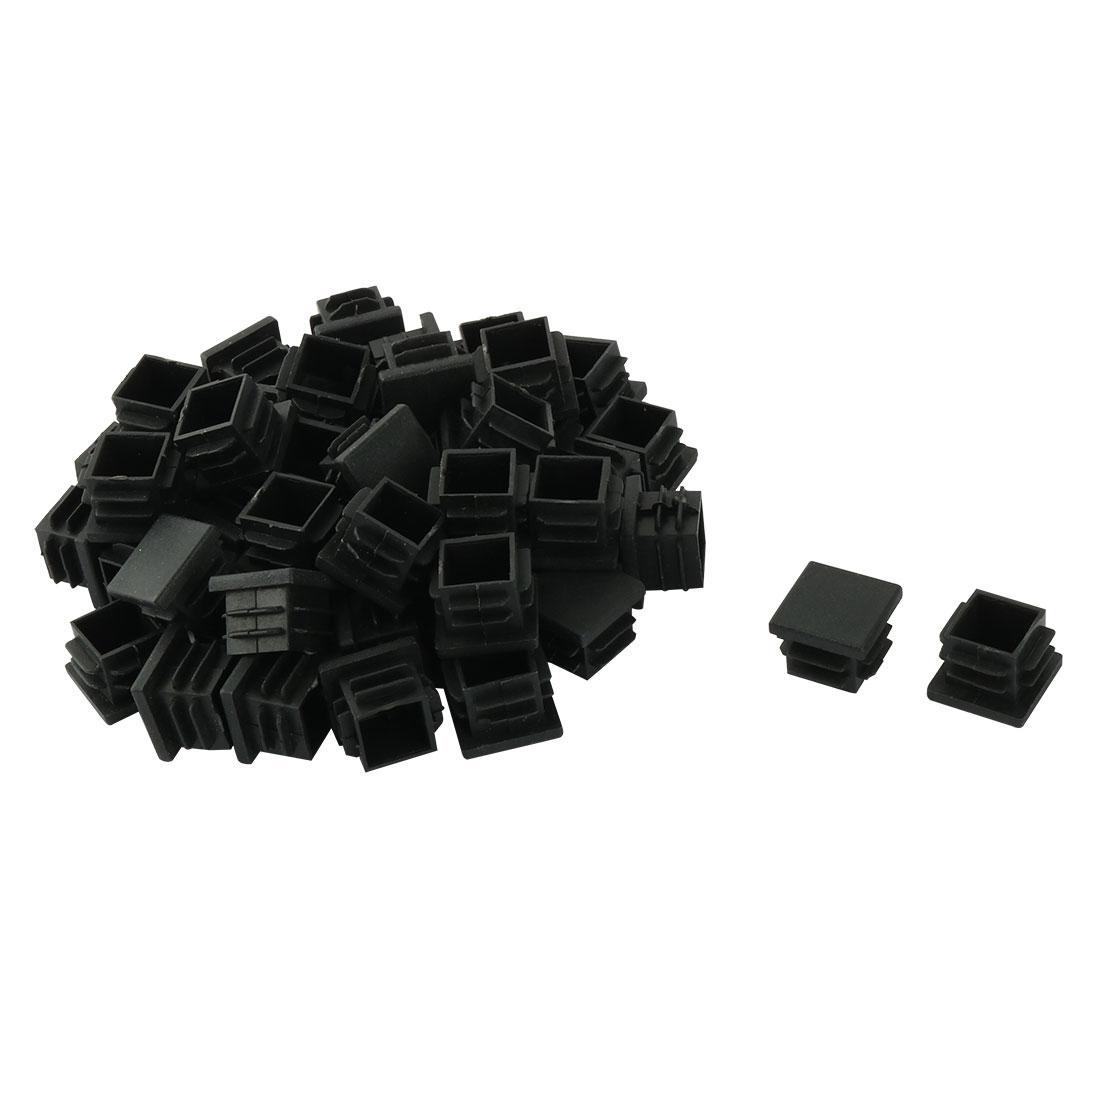 Furniture Table Chair Legs Plastic Square Tube Pipe Insert Cap Cover Black 19 x 19mm 50pcs